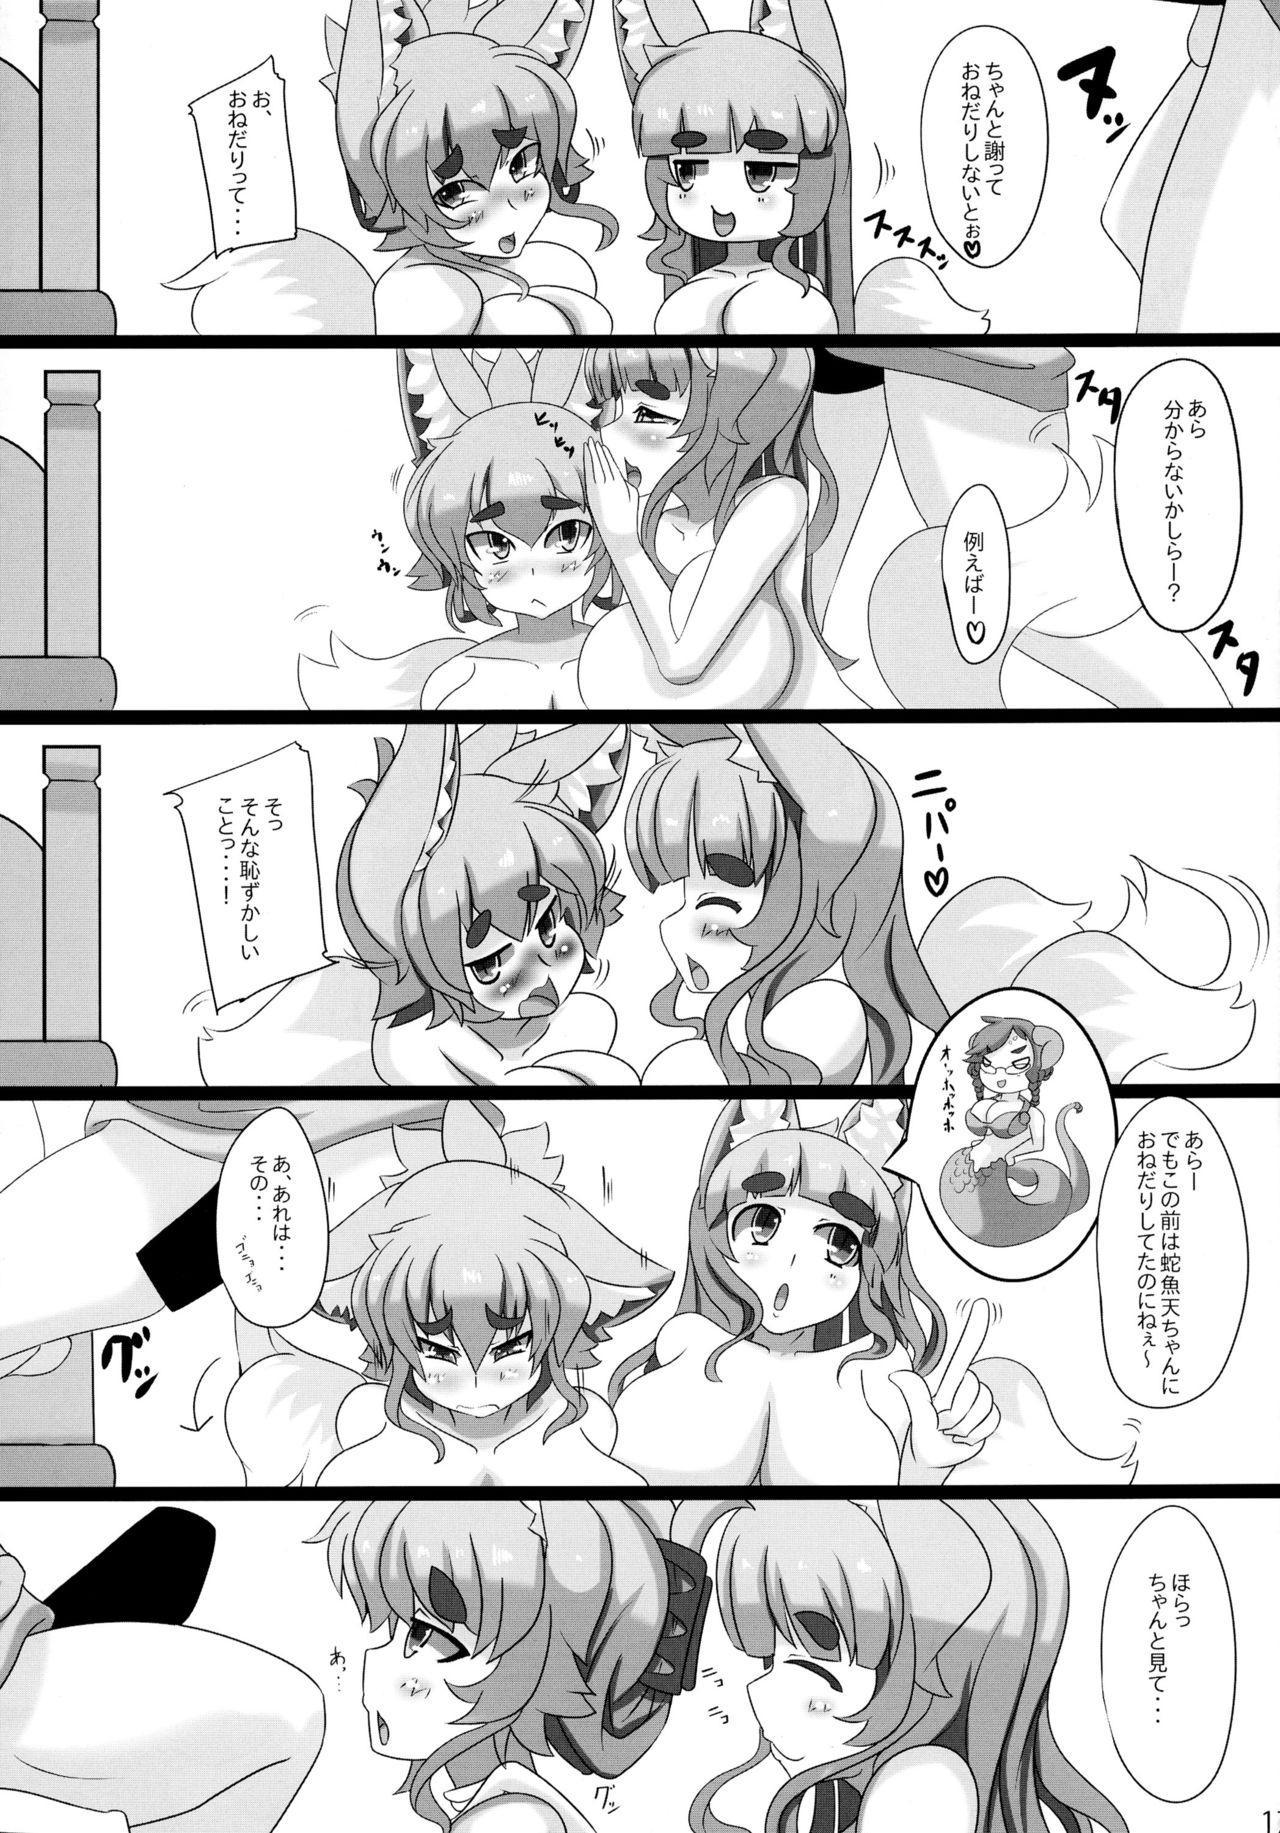 Kitsune-san no H na Hon 16